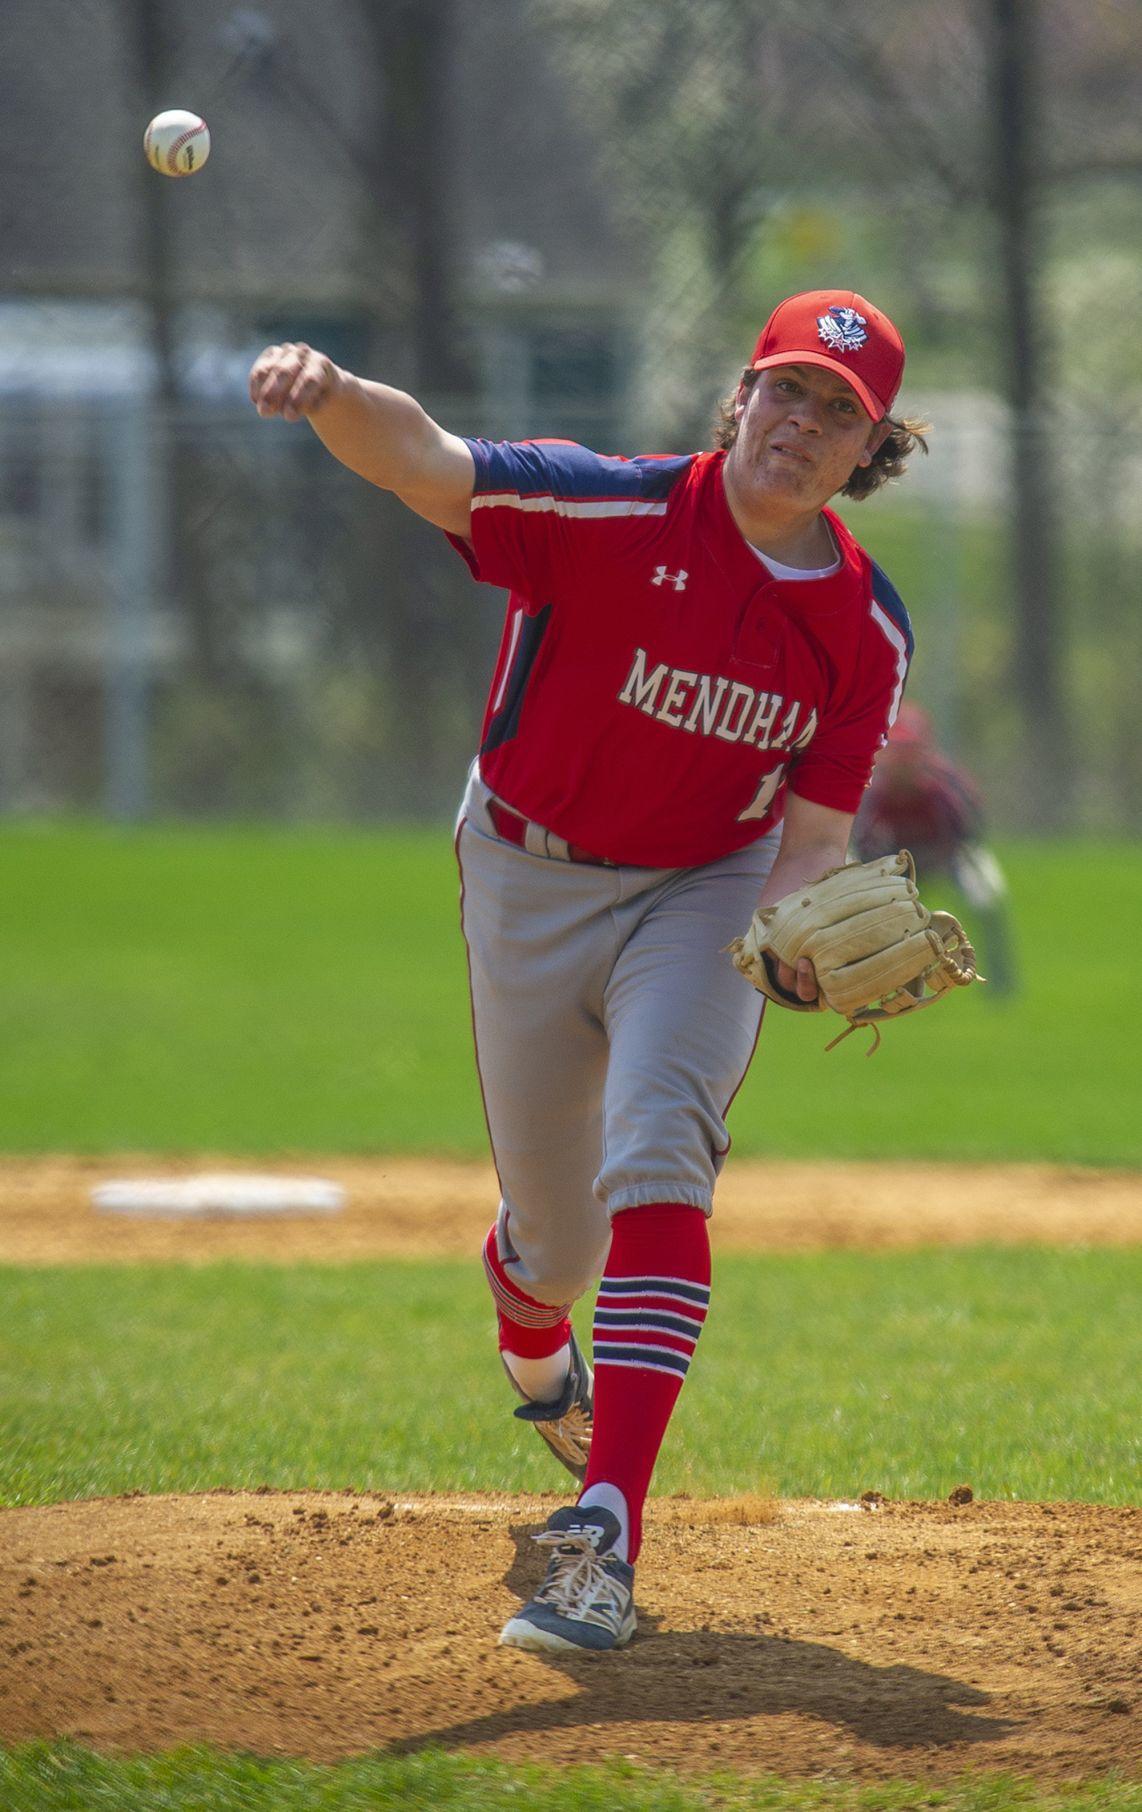 Mendham Logan Shortall baseball